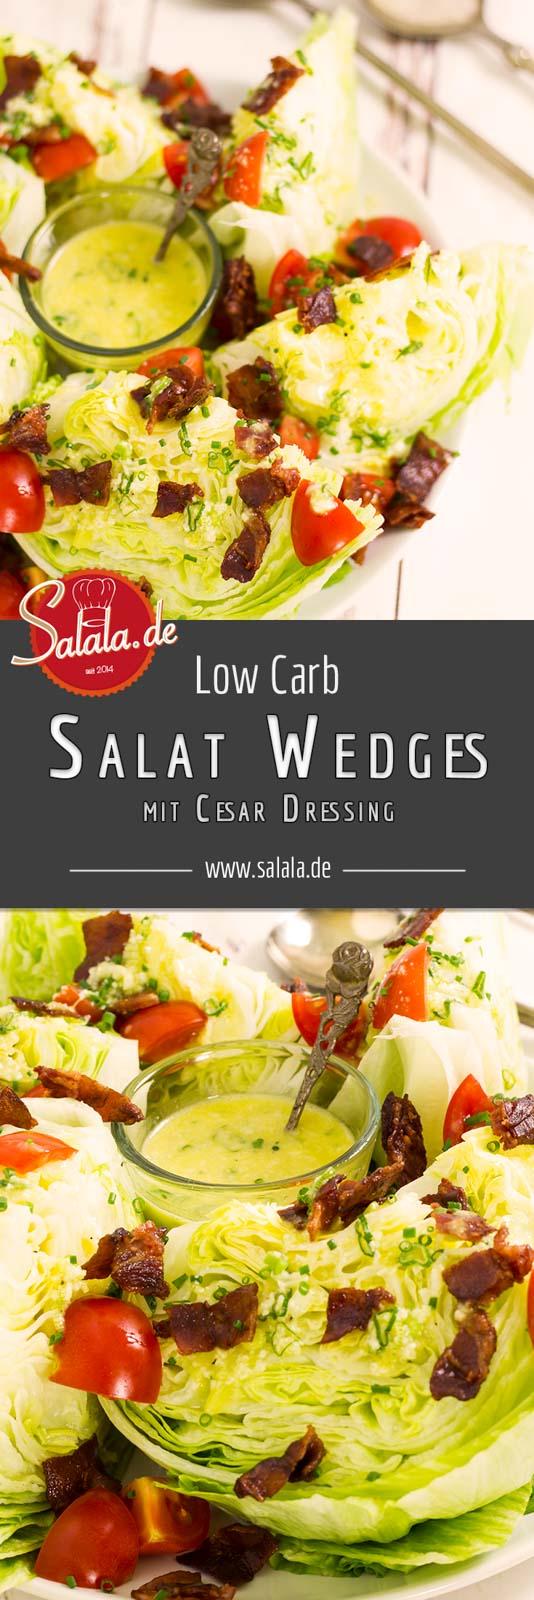 Salat Wedges - by salala.de - mit Cesar Dressing Rezept Low Carb ohne Zucker